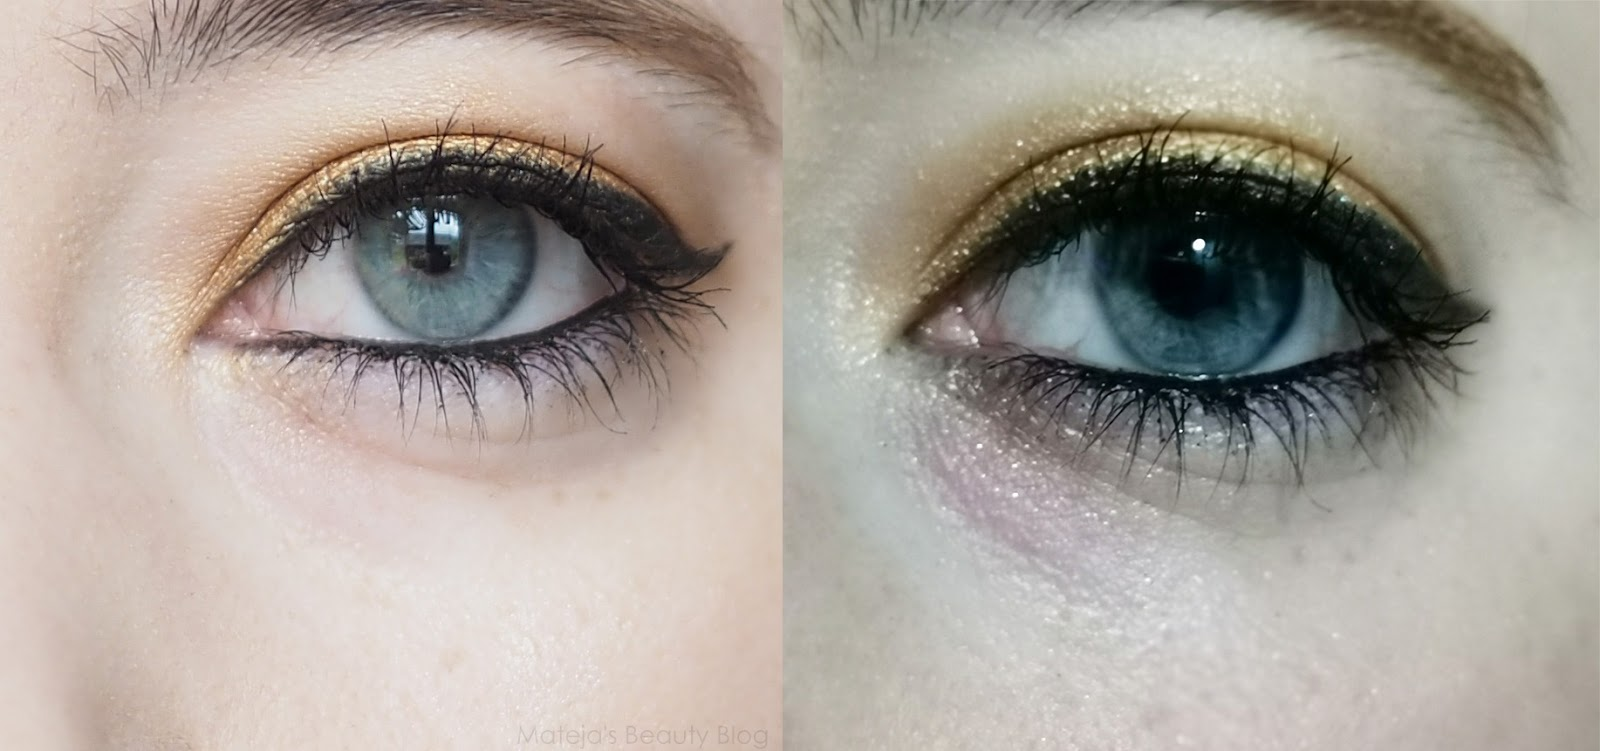 mateja s beauty blog